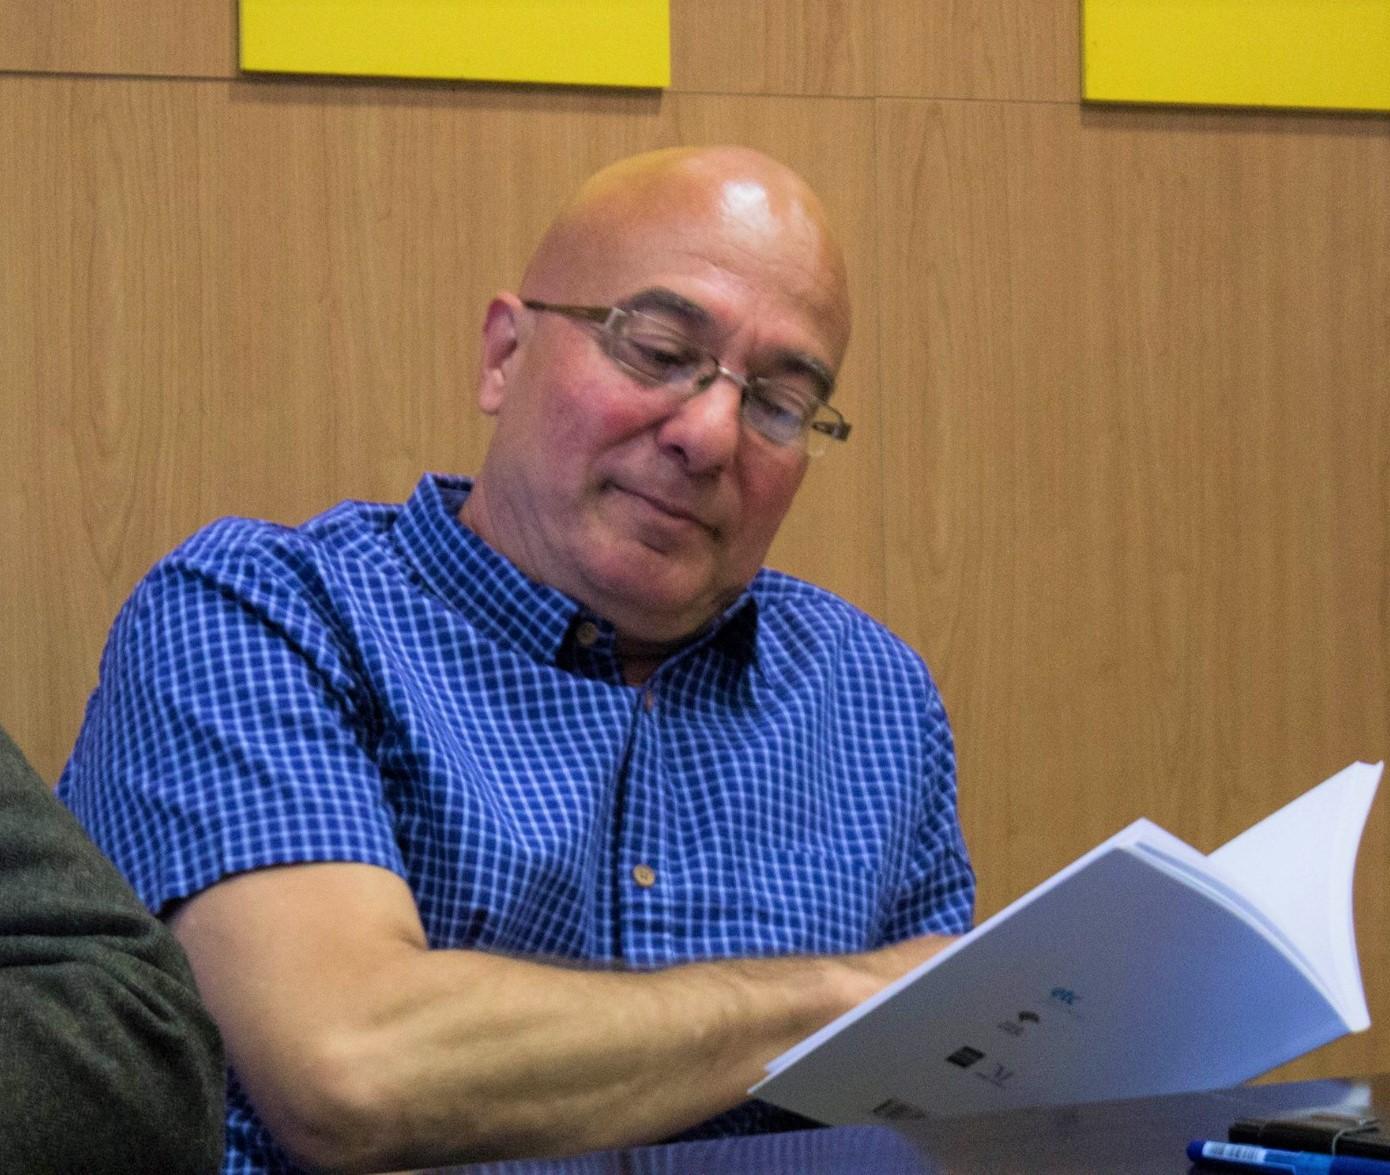 Mario Castillo